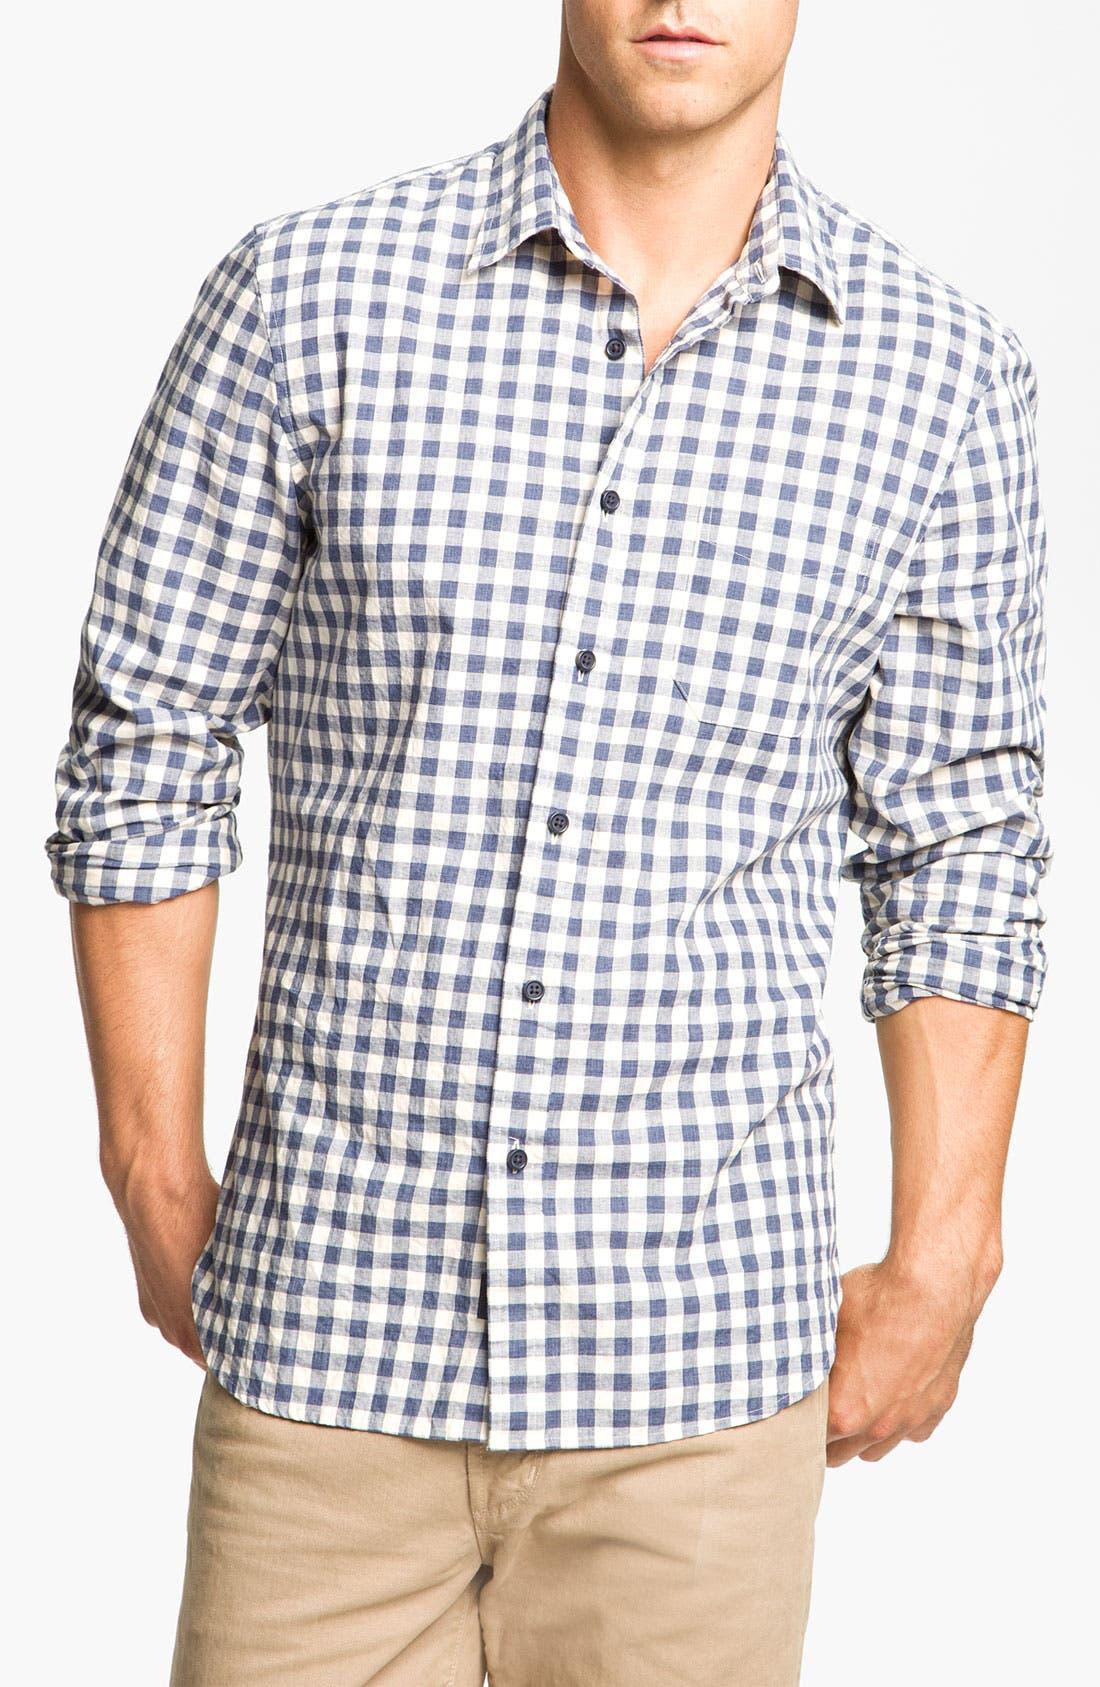 Main Image - Wallin & Bros. Check Poplin Sport Shirt